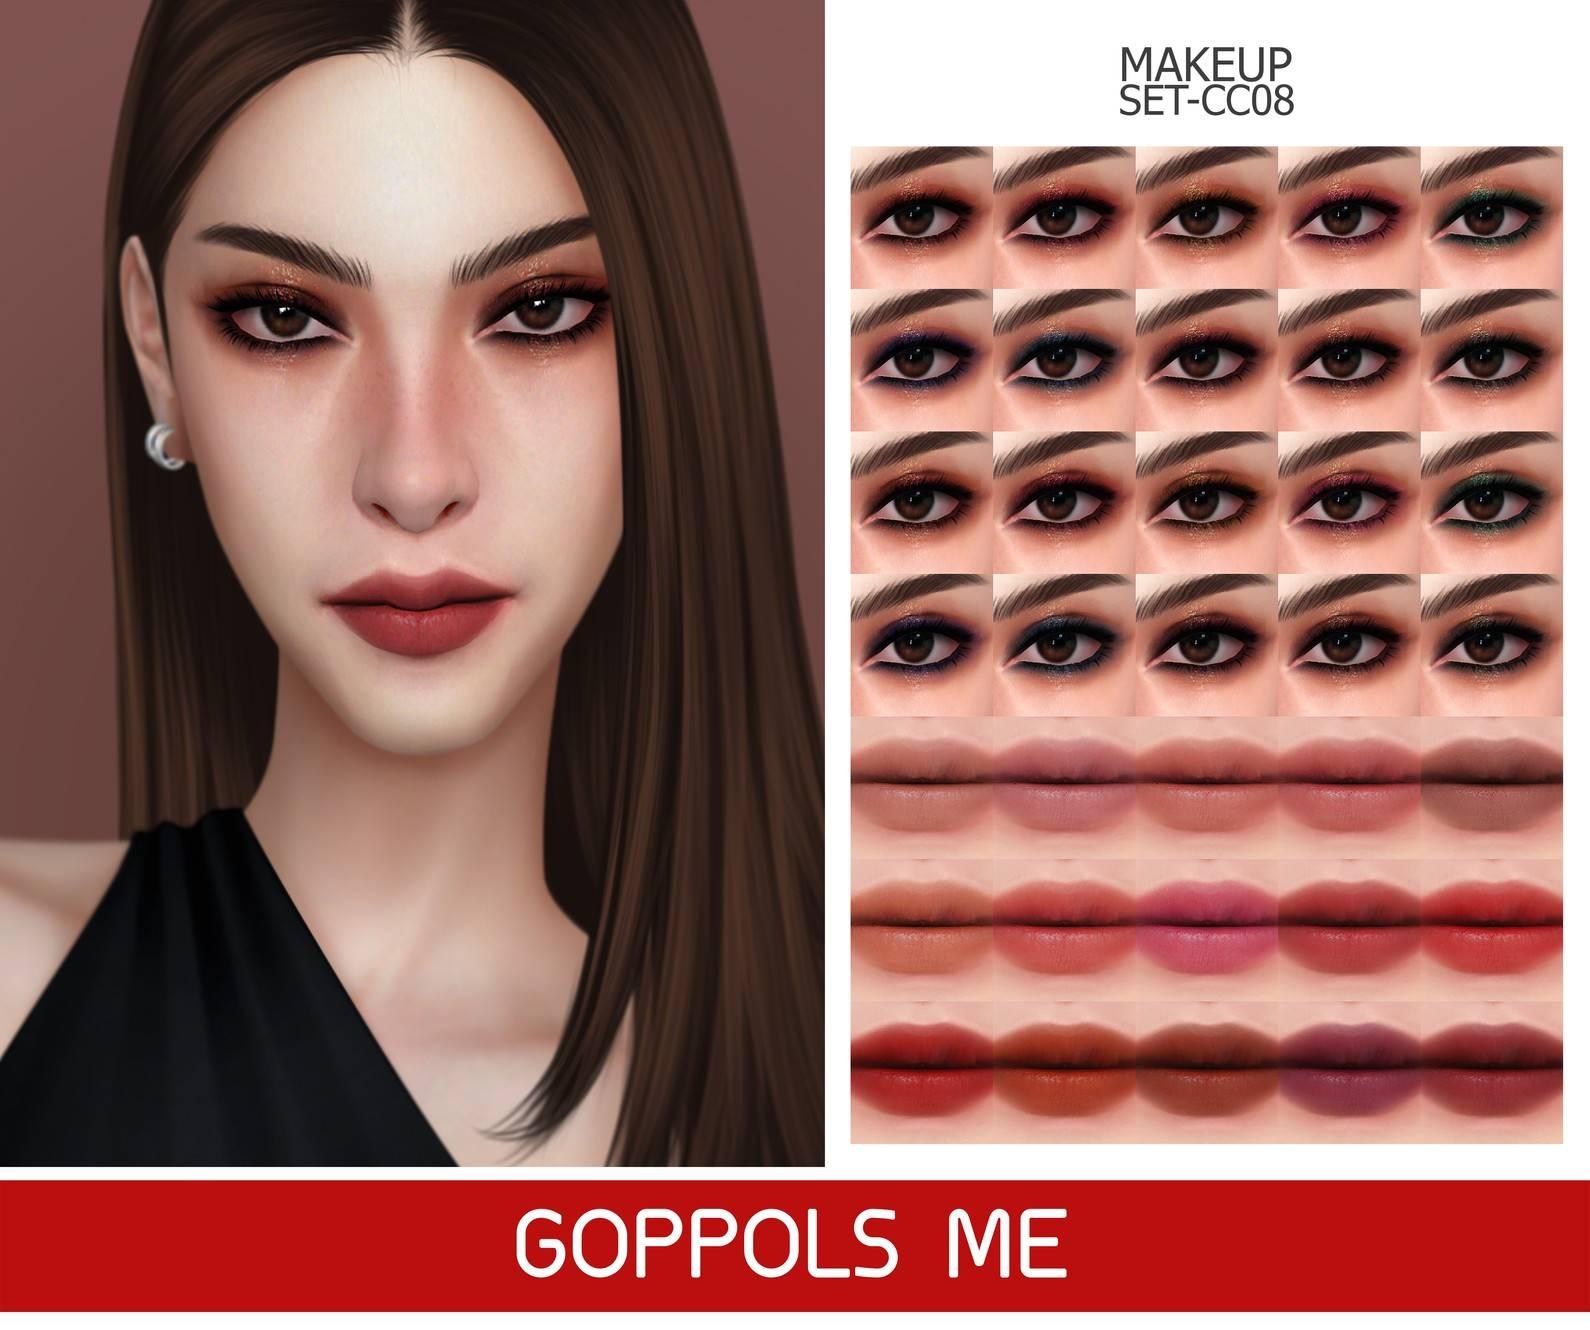 Набор косметики MAKEUP SET CC08 -